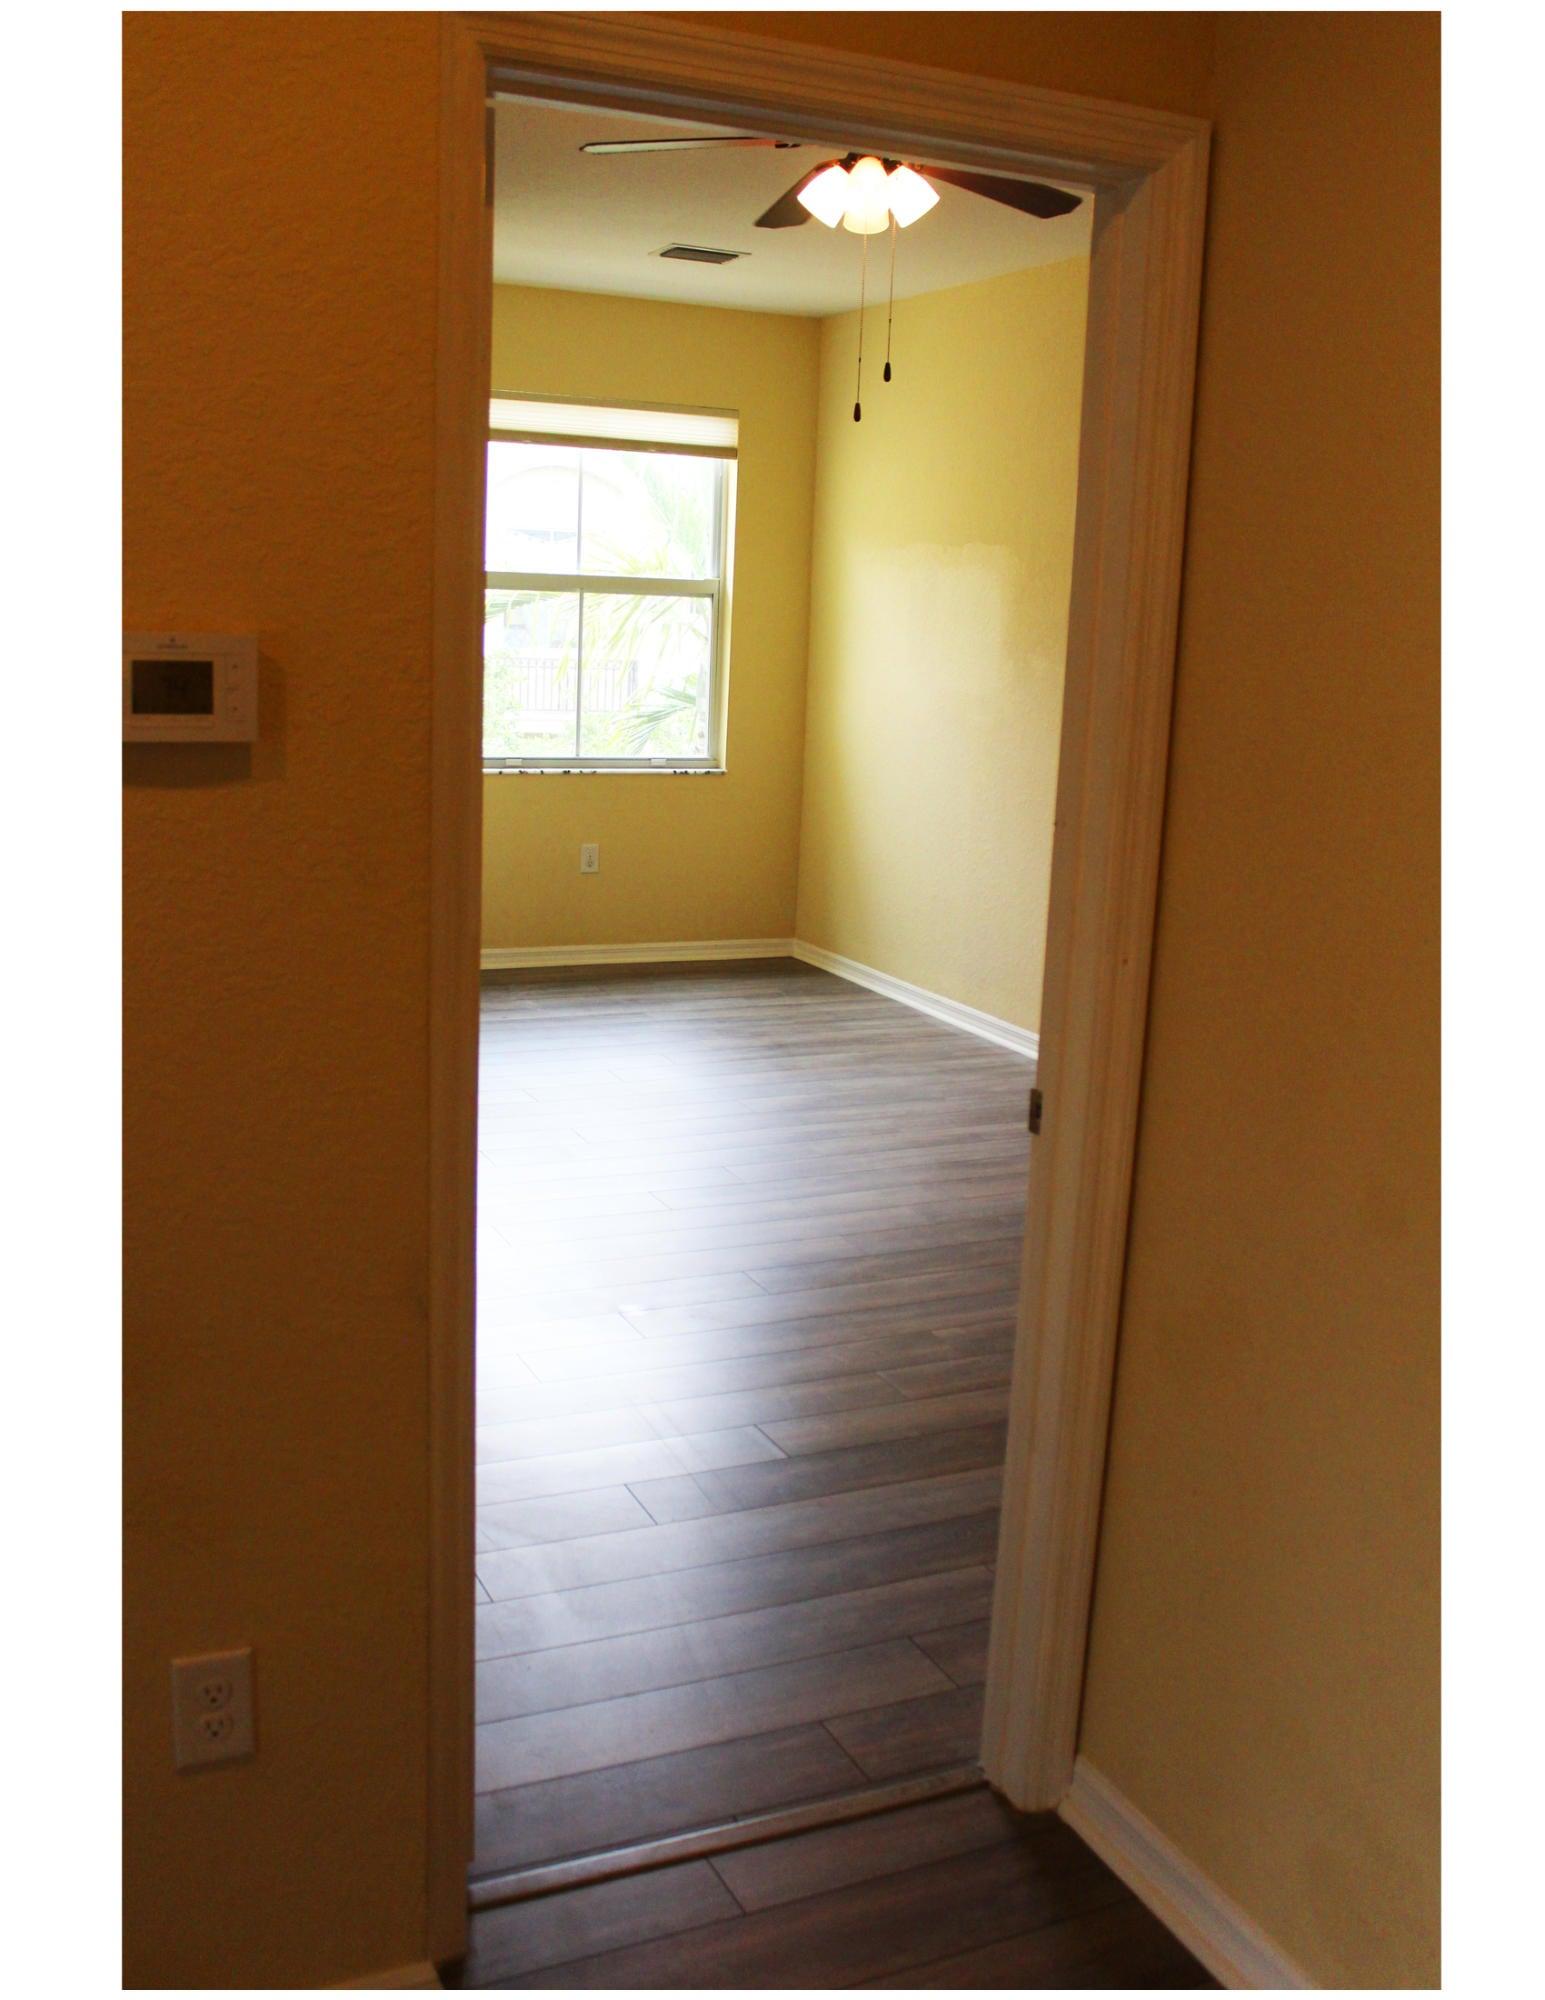 29-Mstr Bedroom 1